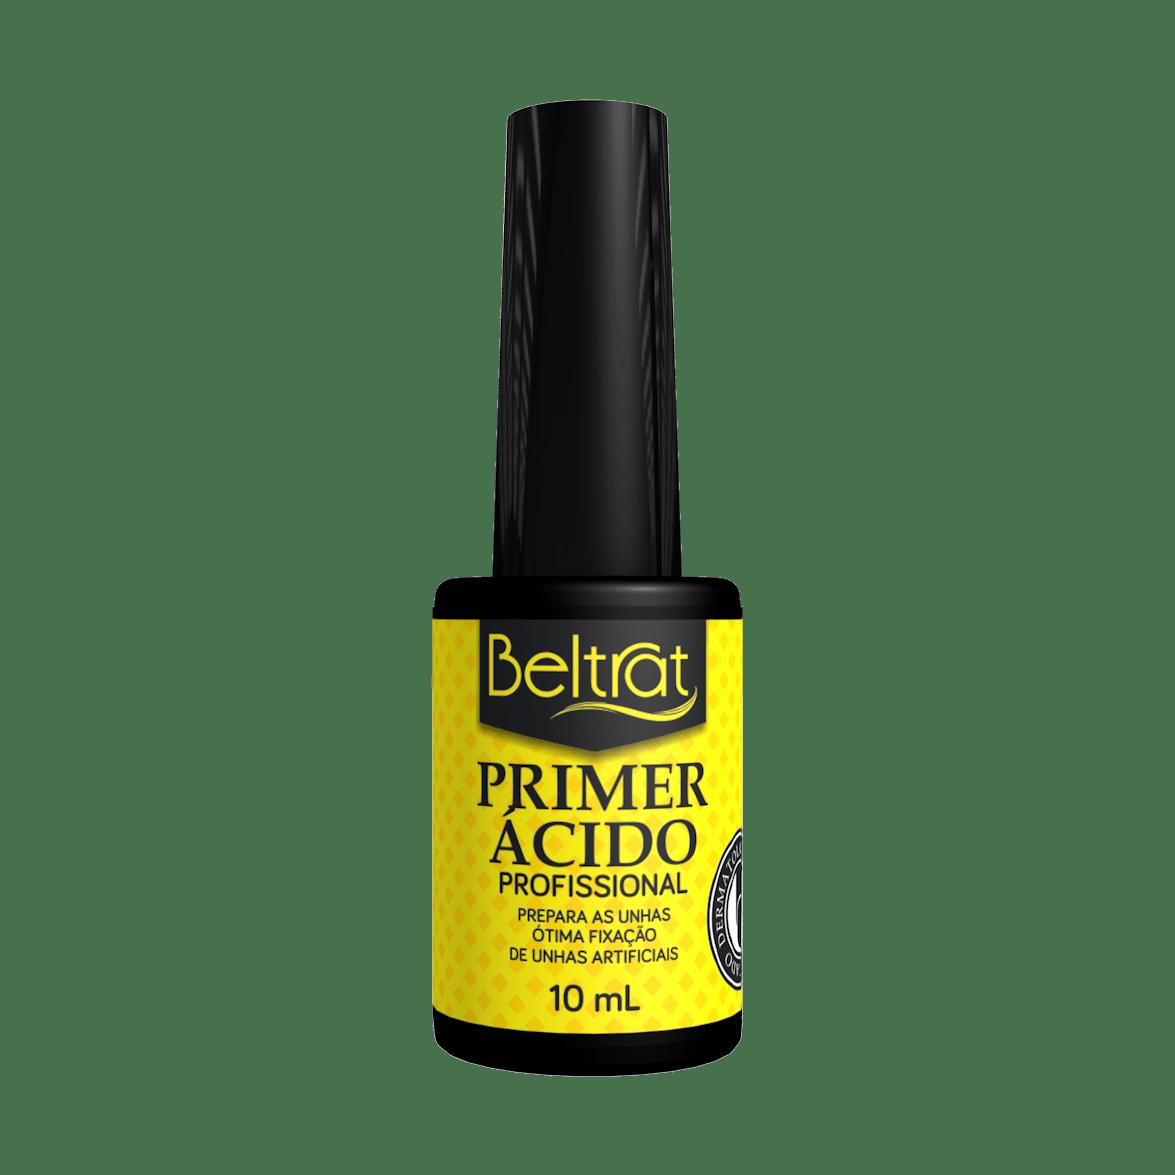 Primer ácido BELTRAT 10ml  - Sílvia Pedrarias & Cia